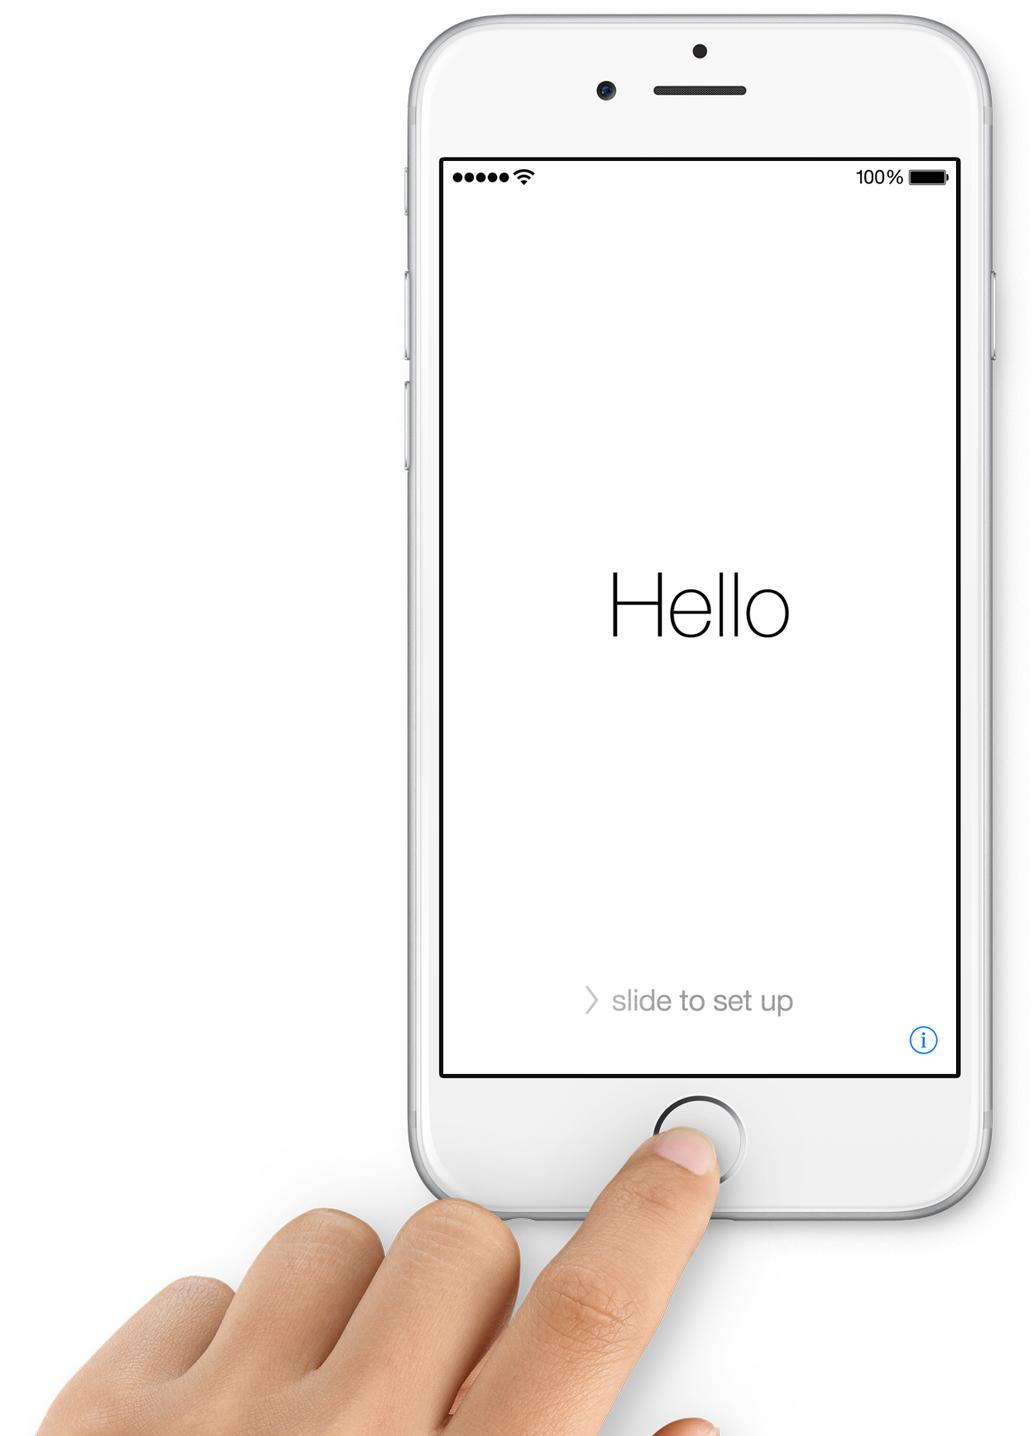 data_applenews_iphone6_setup_hero_201409